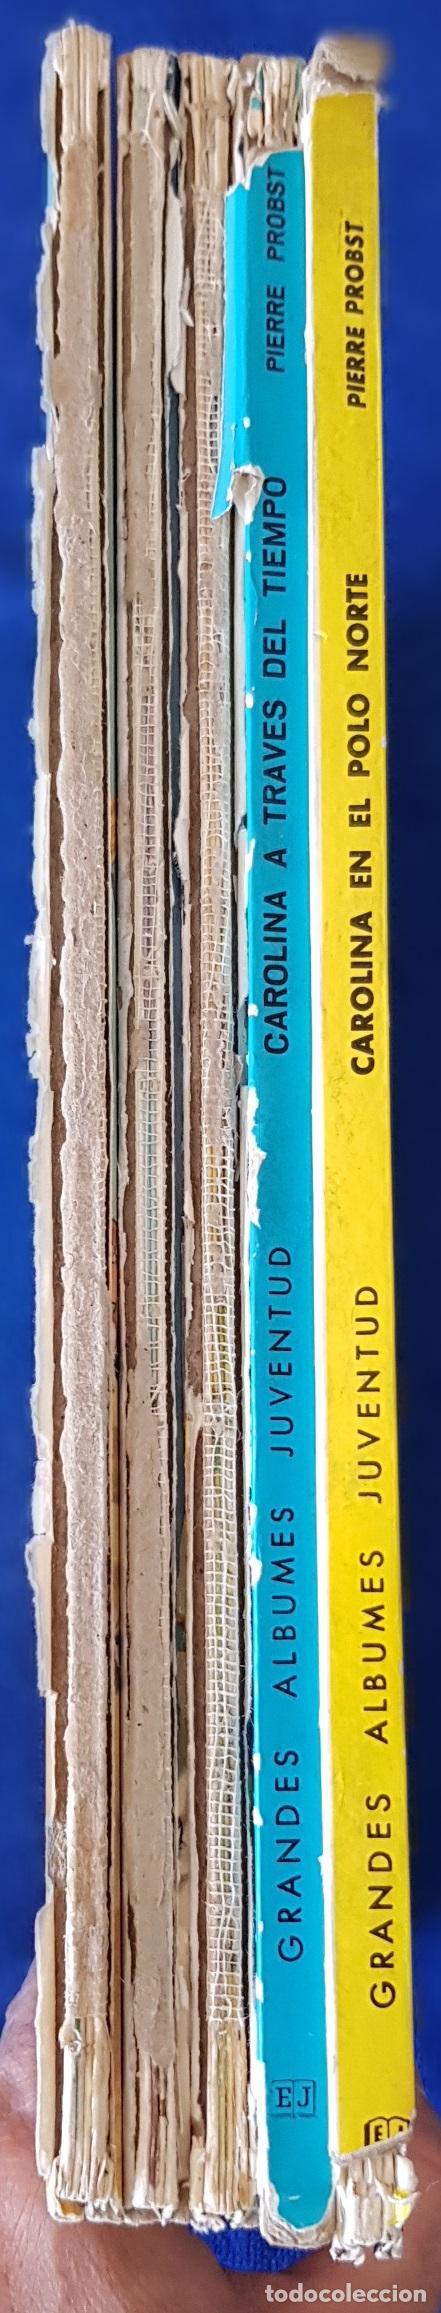 Cómics: Carolina - Pierre Prost - Grandes Albumes Juventud (1961 / 1971) - Foto 3 - 184074646